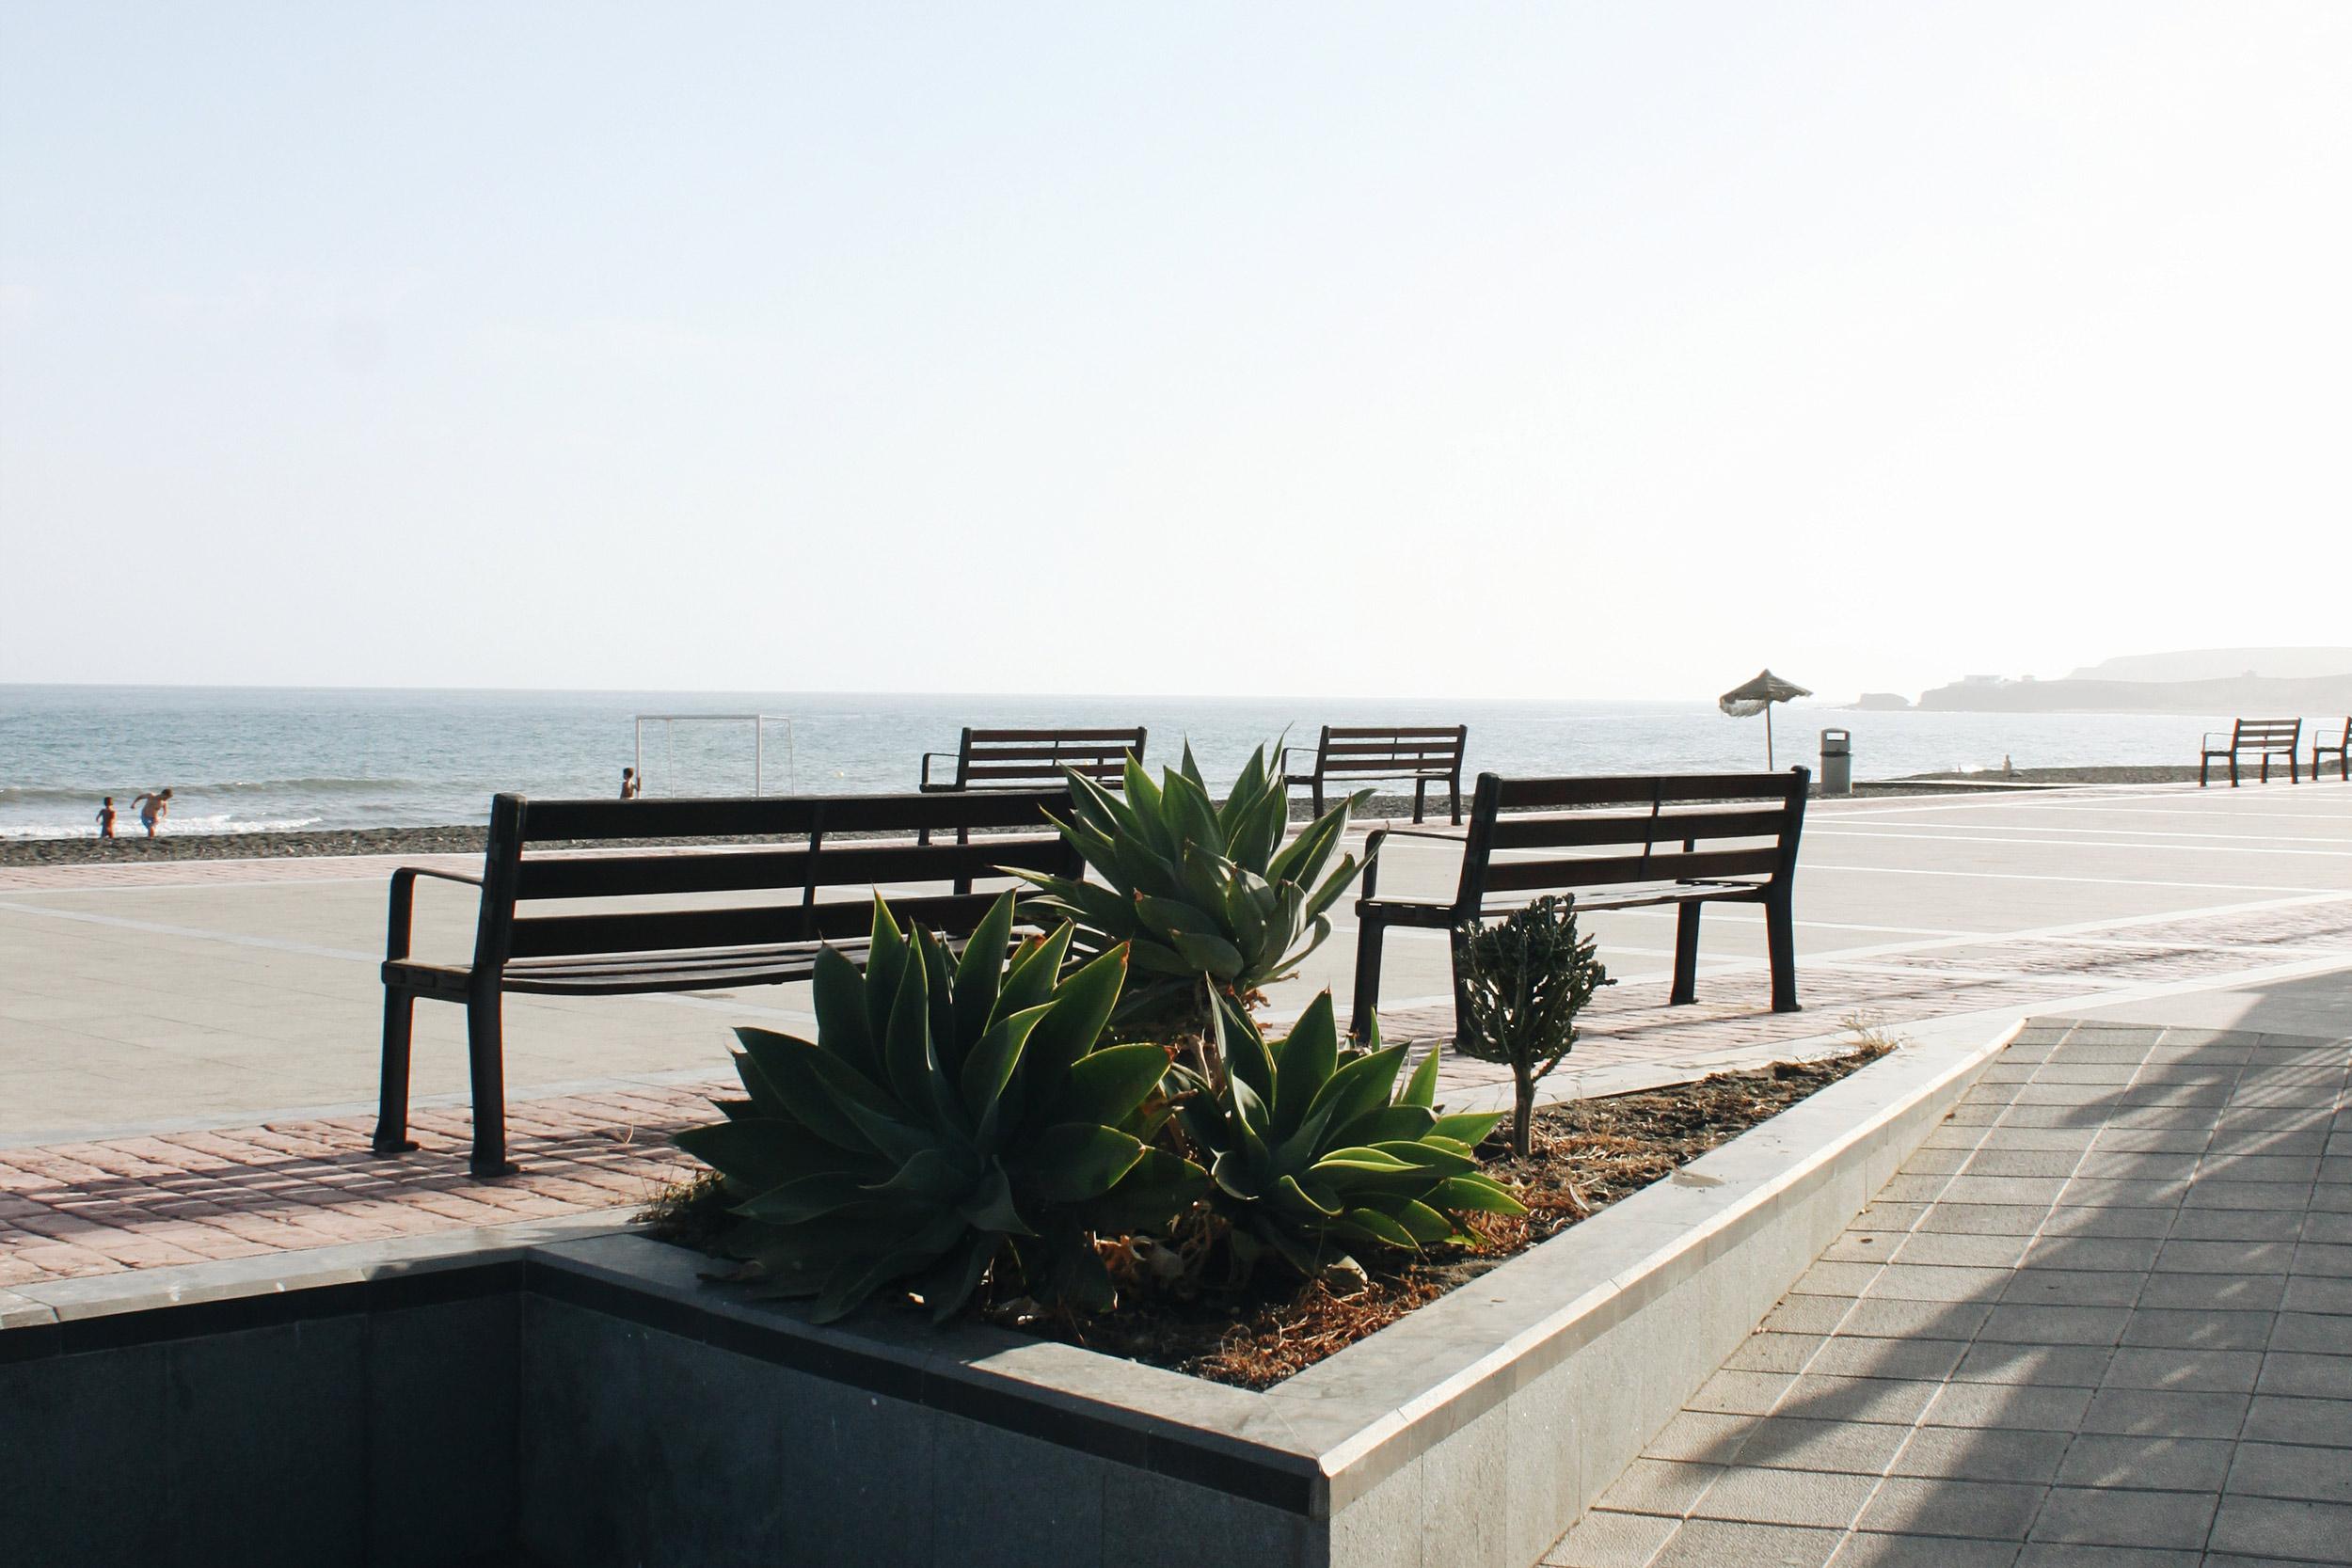 travel to Fuerteventura - Canary islands